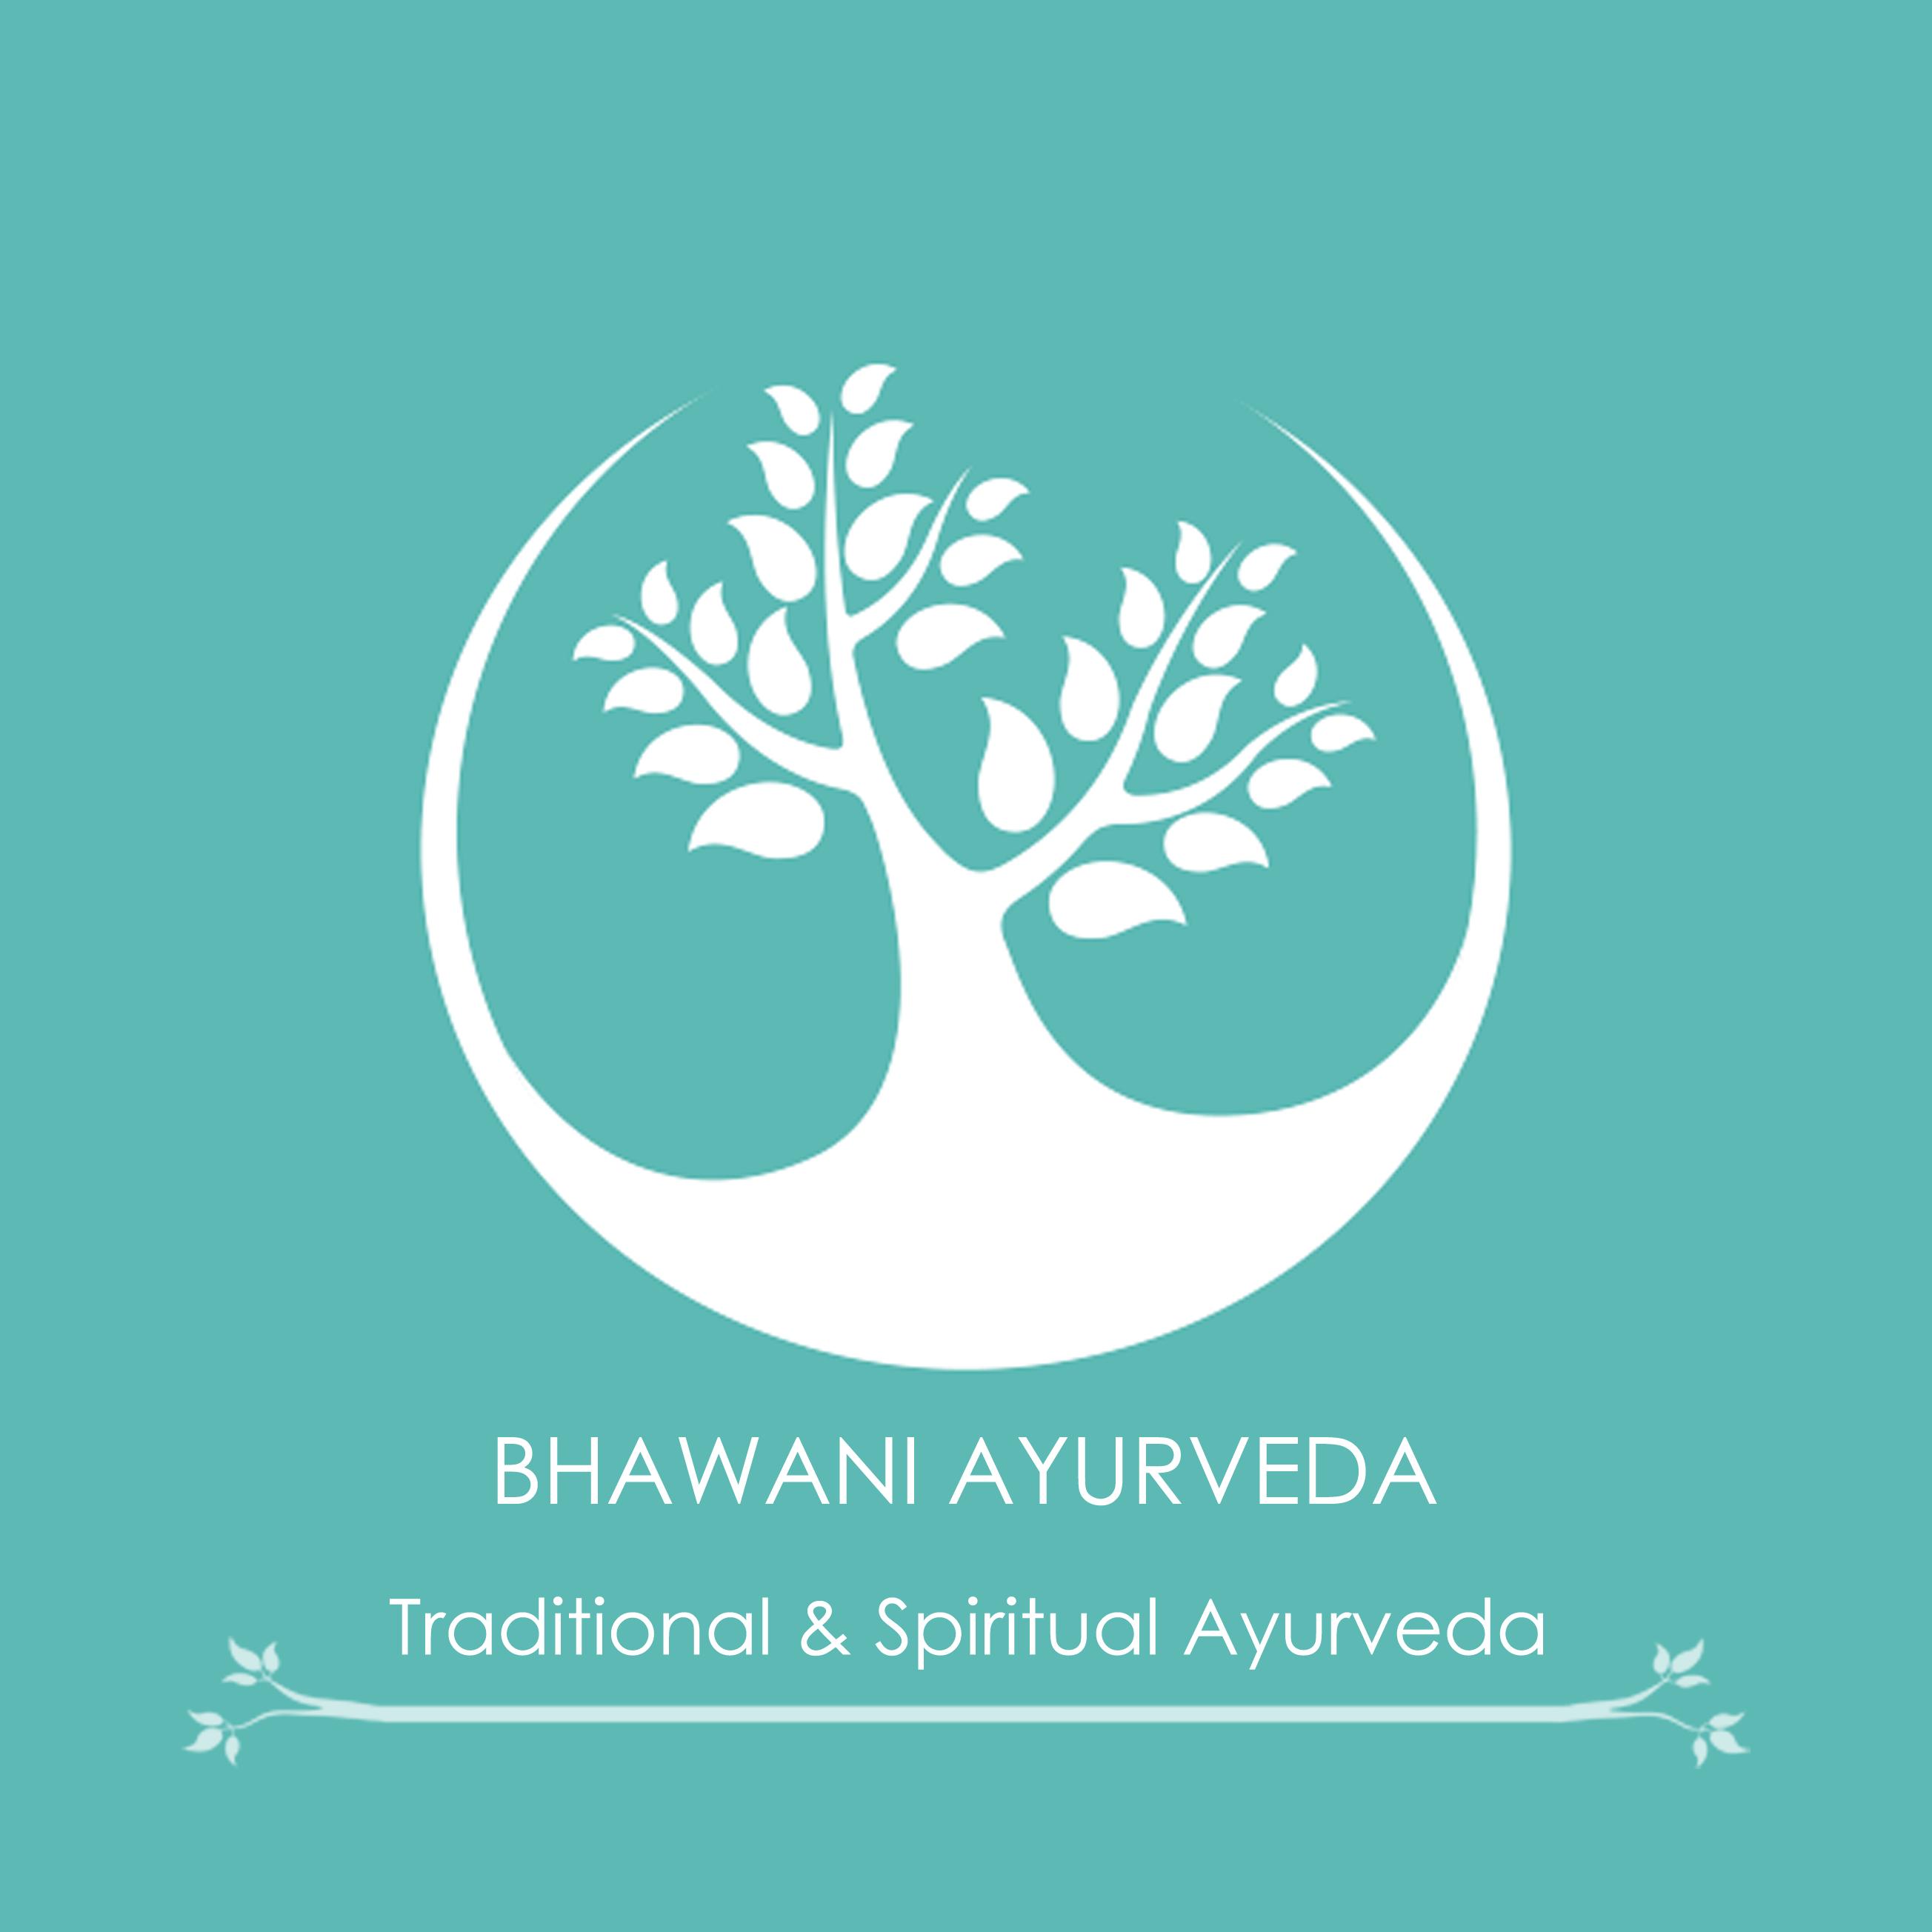 http://bhawaniayurveda.com/wp-content/uploads/2017/03/finallogo-updated.png